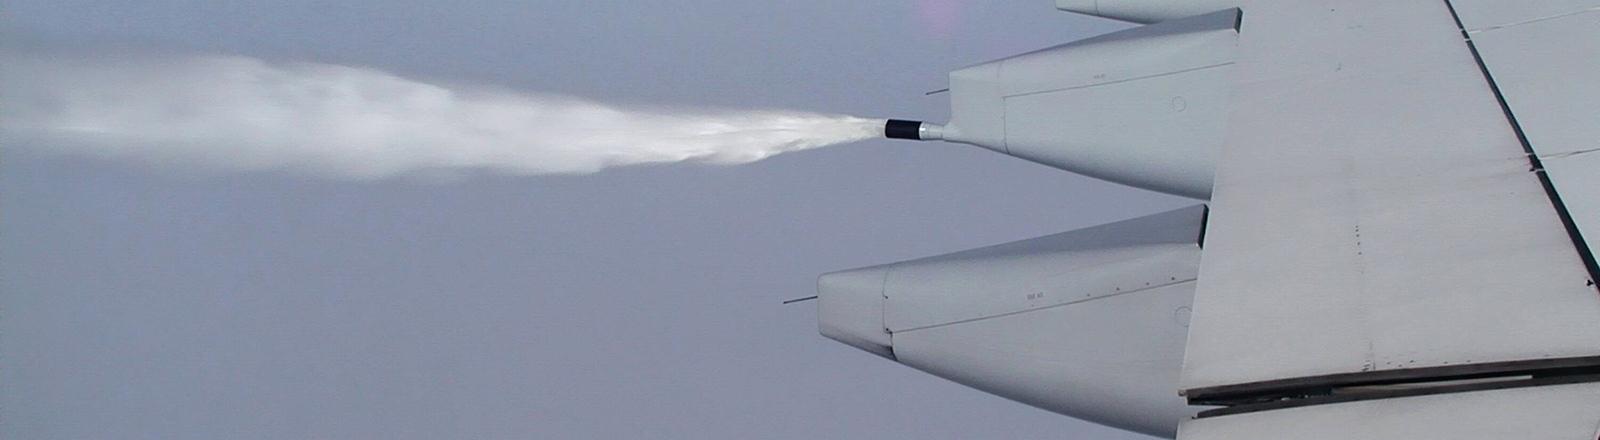 Flugzeug lässt Kerosin ab.